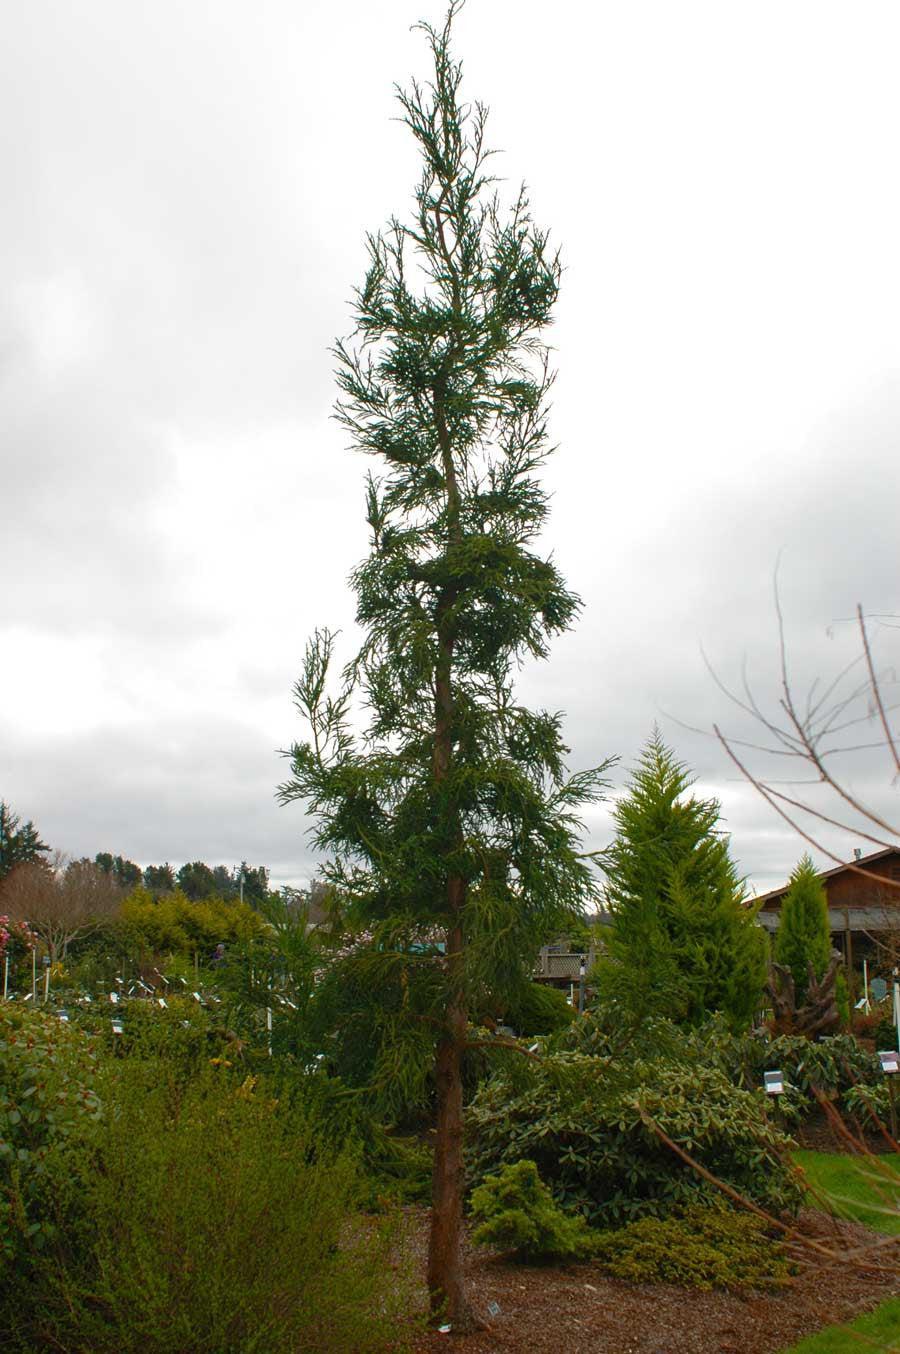 Ground Wire Color >> Rasen Sugi | Singing Tree Gardens Nursery